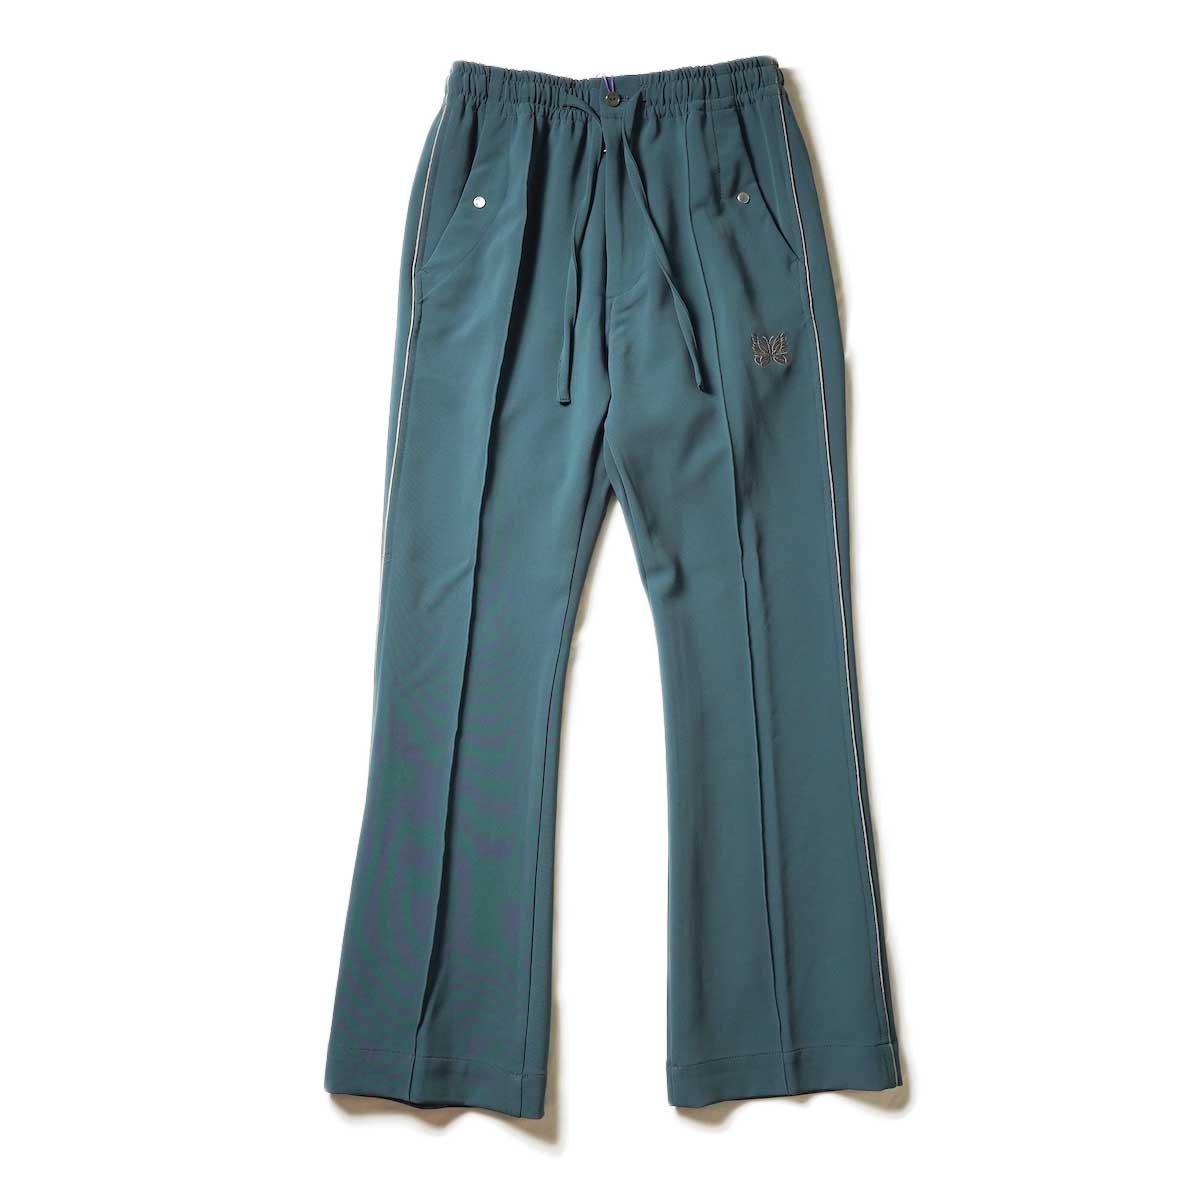 Needles / Piping Cowboy Pants - Pe/Pu Double Cloth (Green)